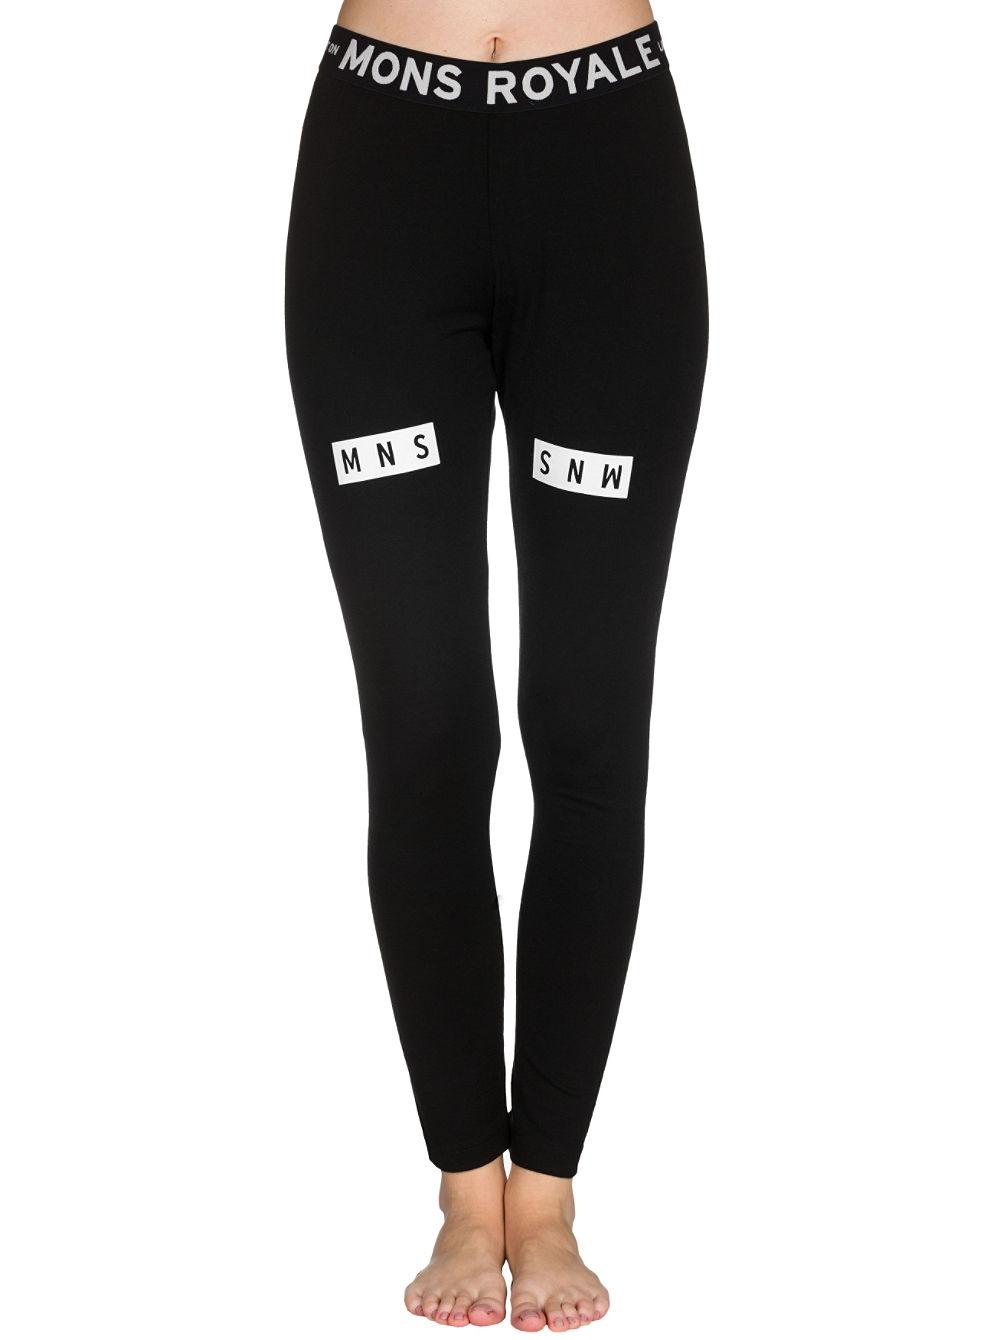 mons-royale-merino-christy-leggings-tech-pants